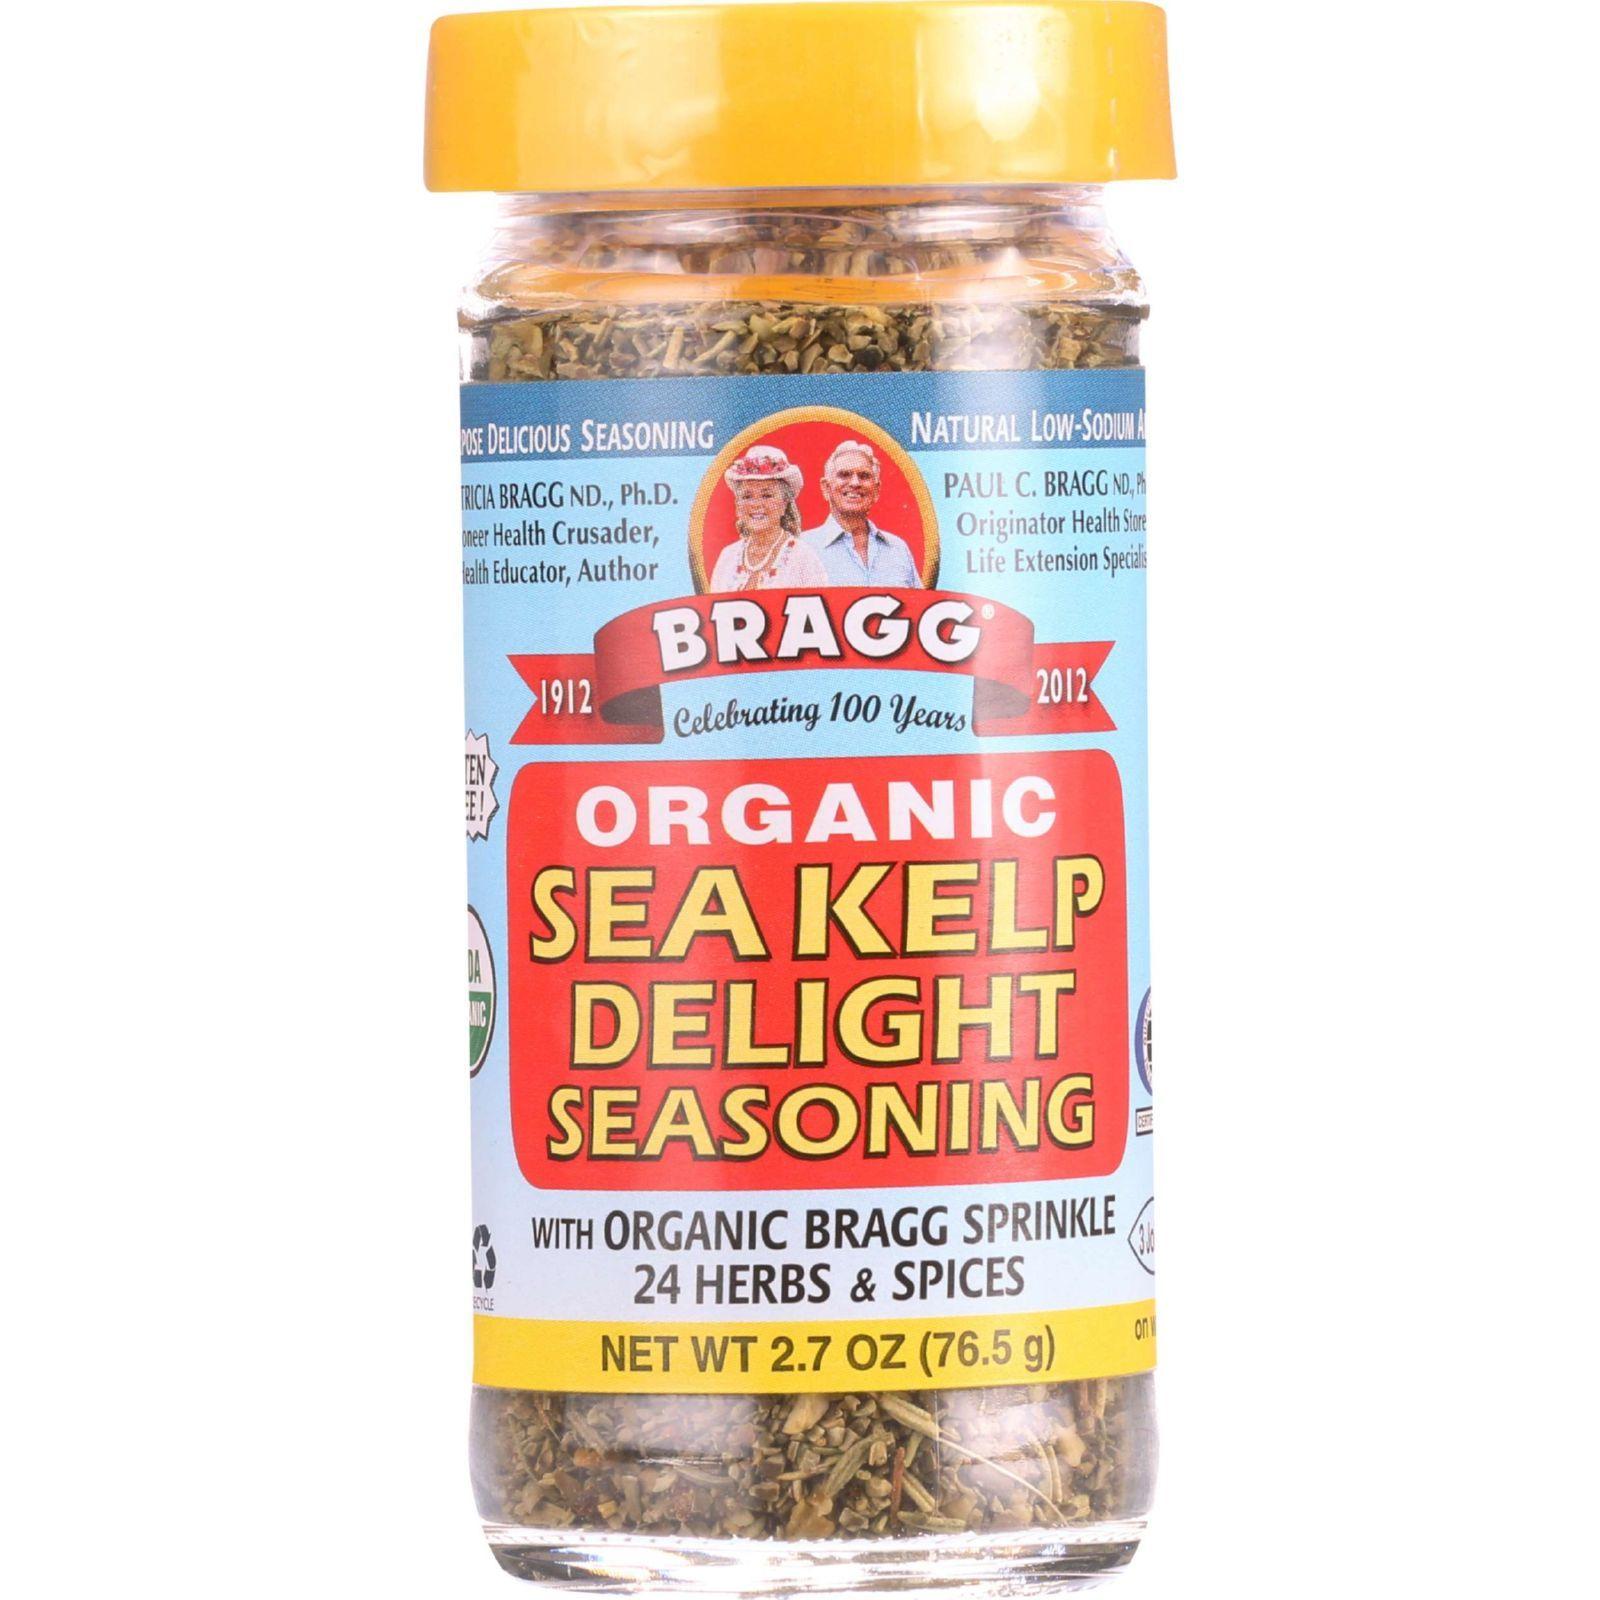 Bragg Seasoning - Organic - Sea Kelp Delight - 2.7 oz - case of 12